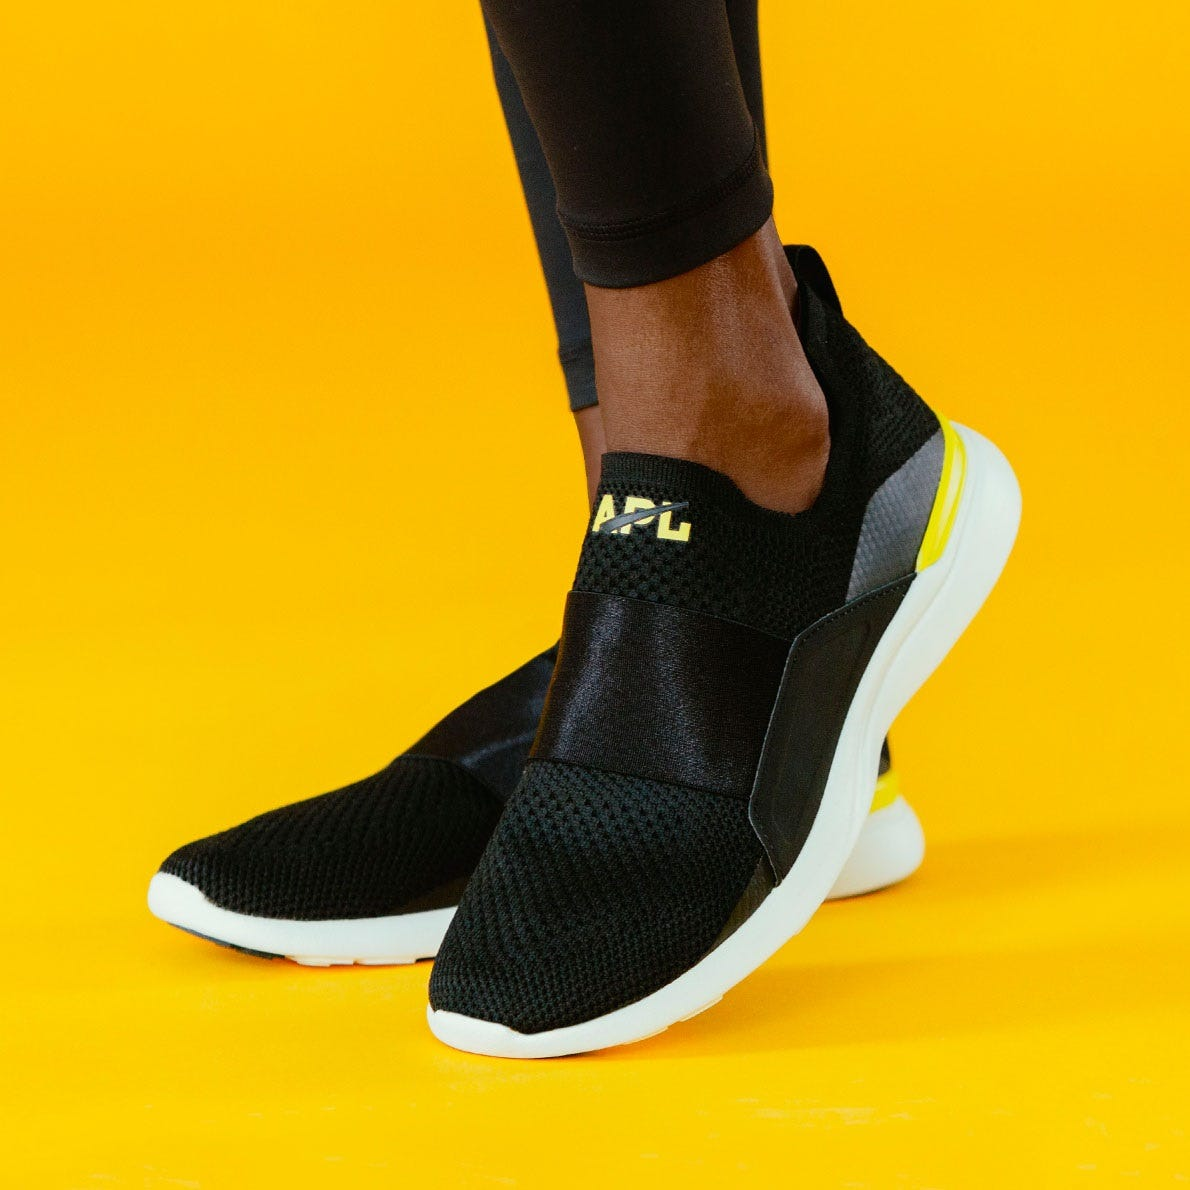 APL x SoulCycle Slip On Shoe \u0026#8211; Womens